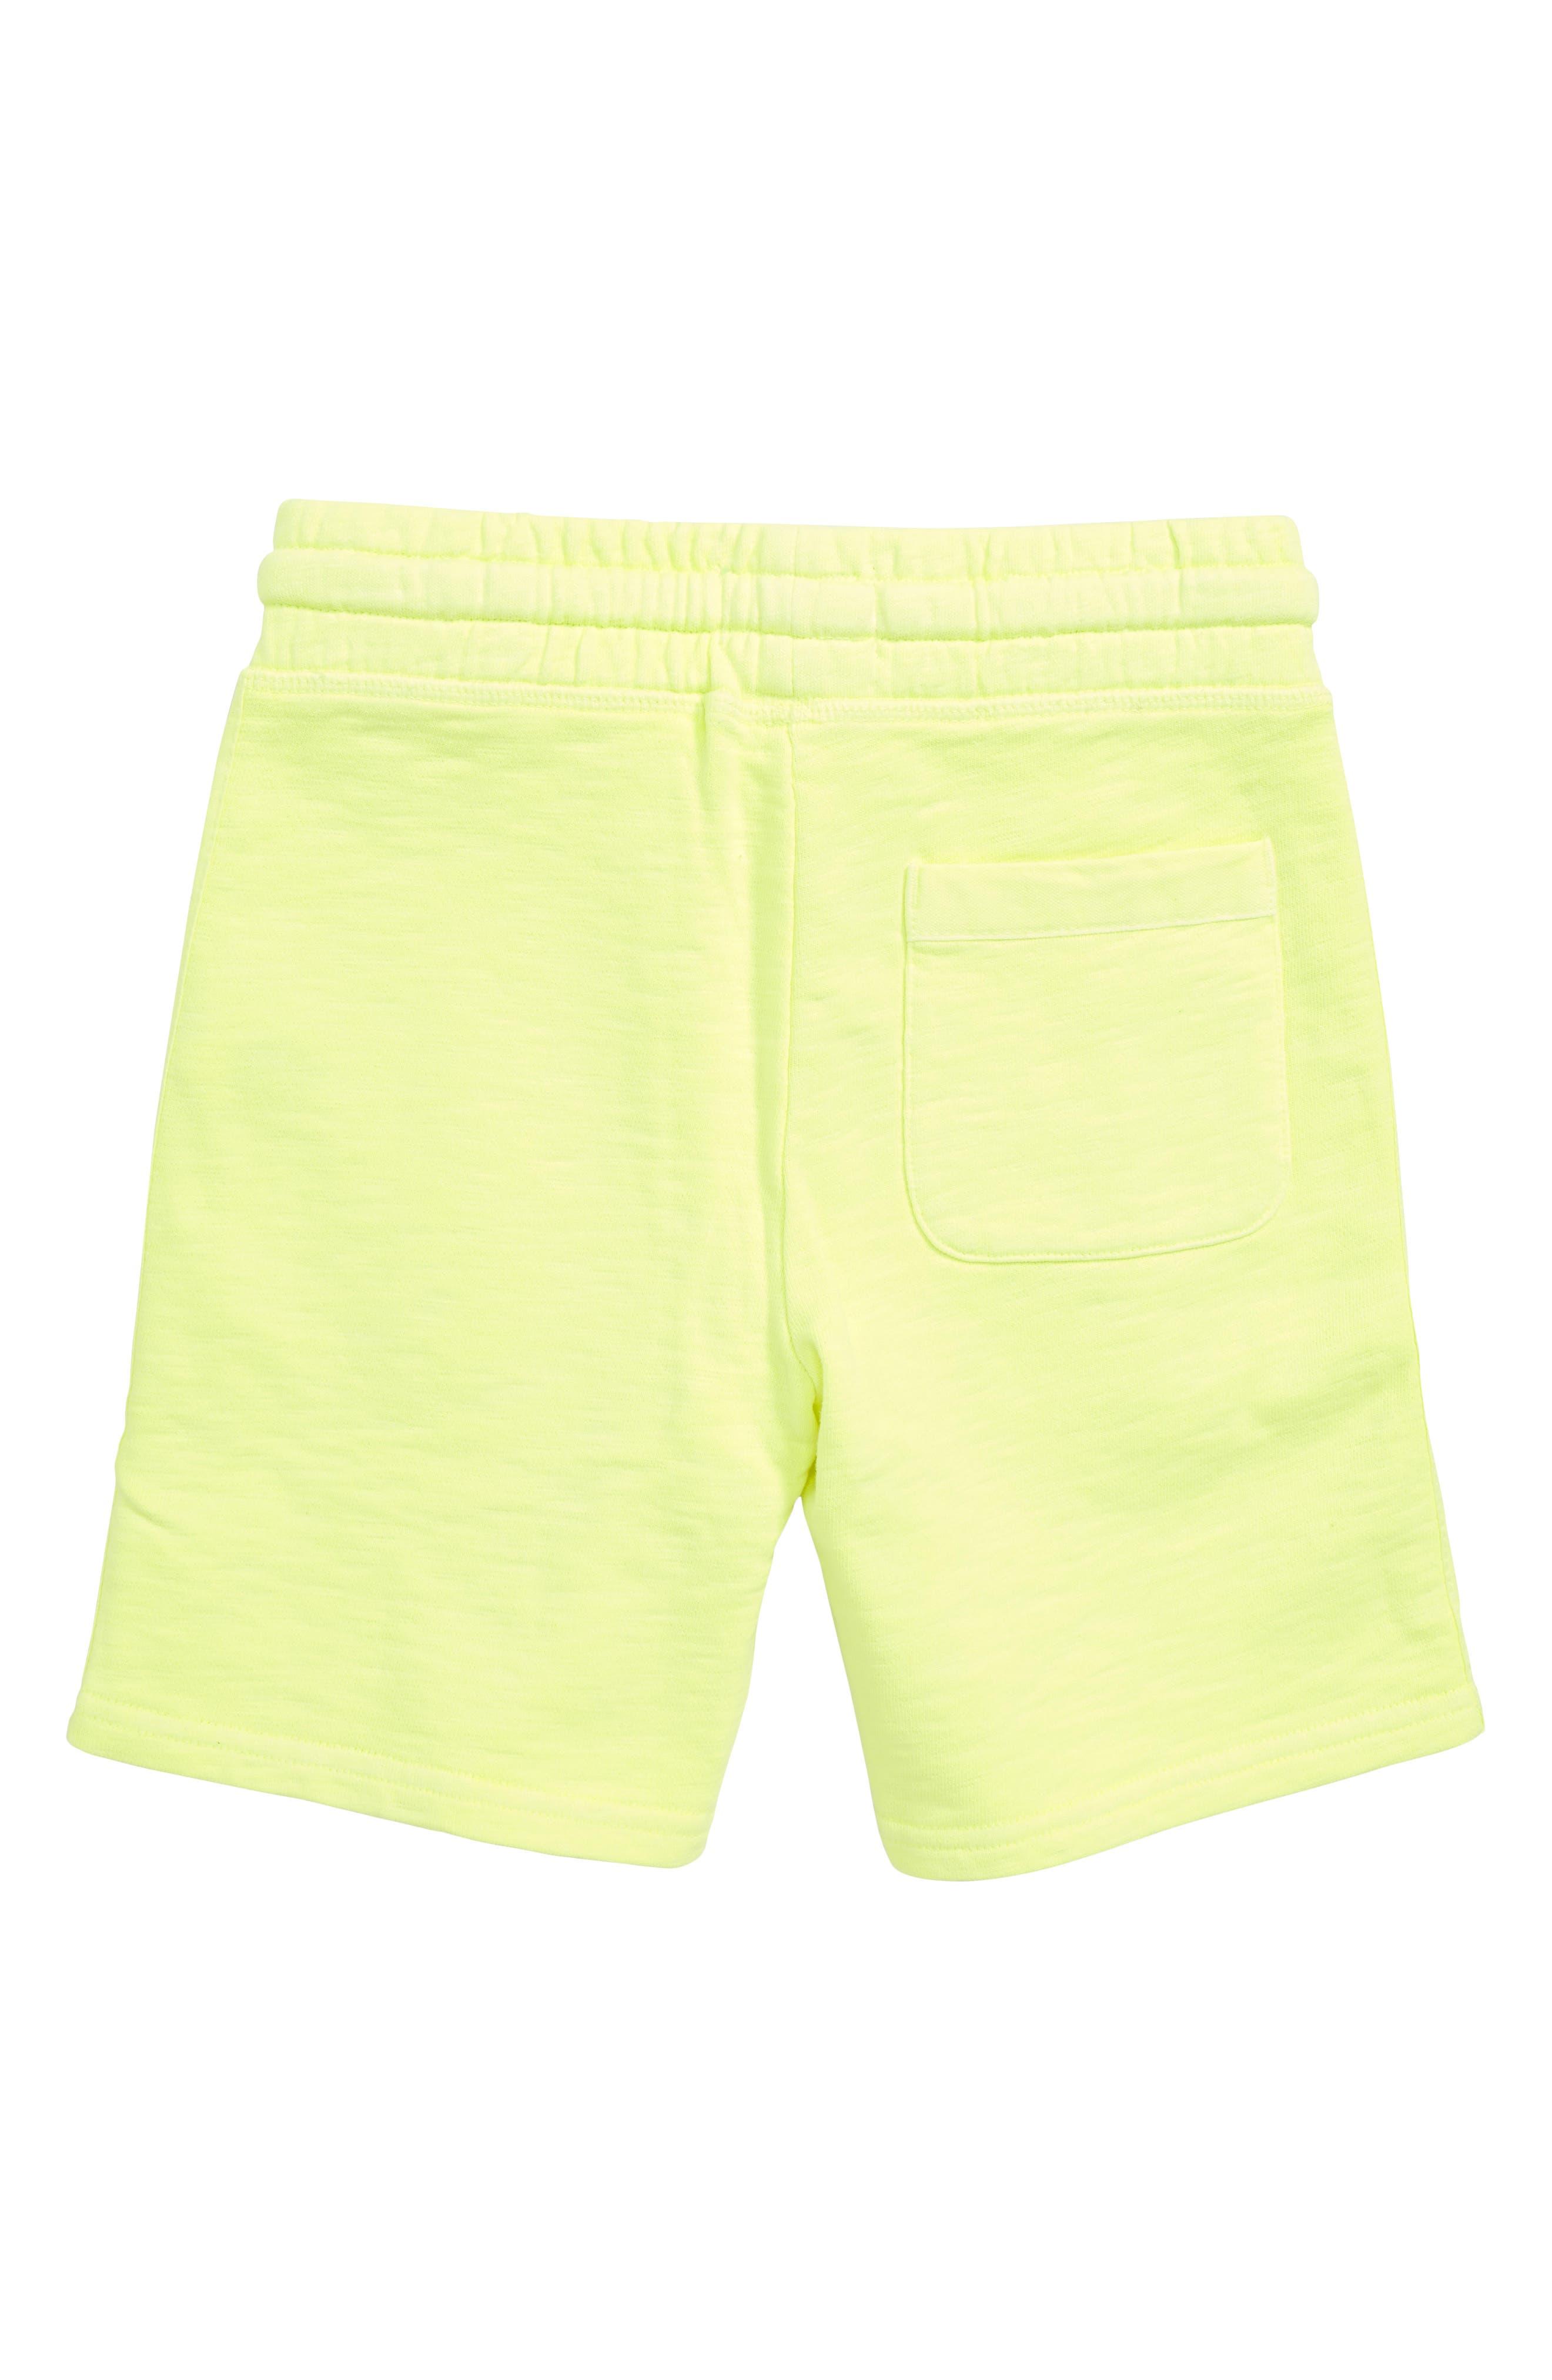 Garment Dyed Sweatshorts,                             Alternate thumbnail 2, color,                             Acid Yellow